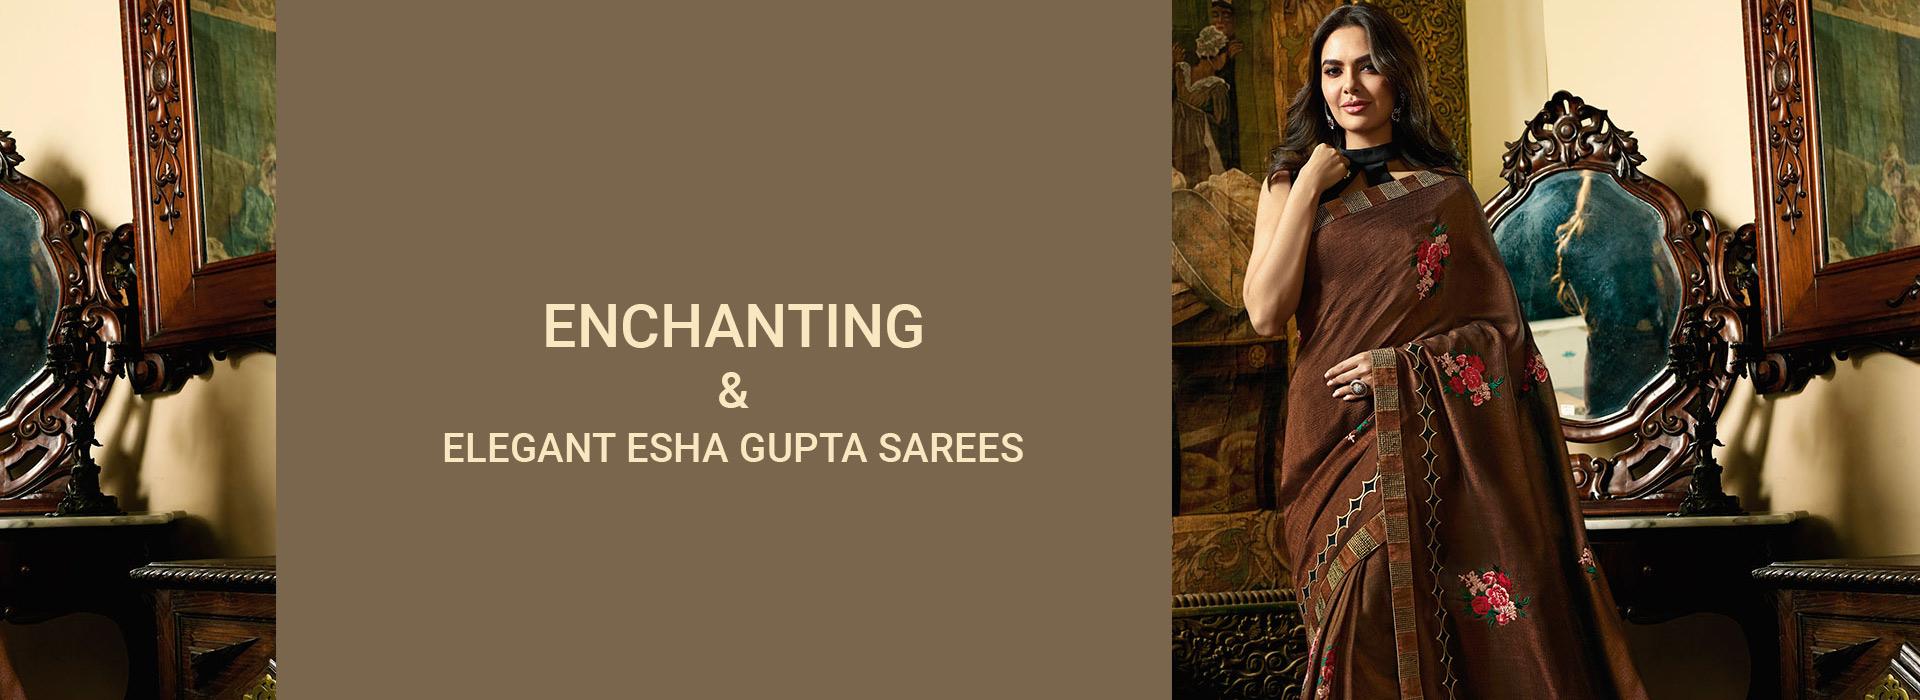 Enchanting and Elegant Esha Gupta Sarees